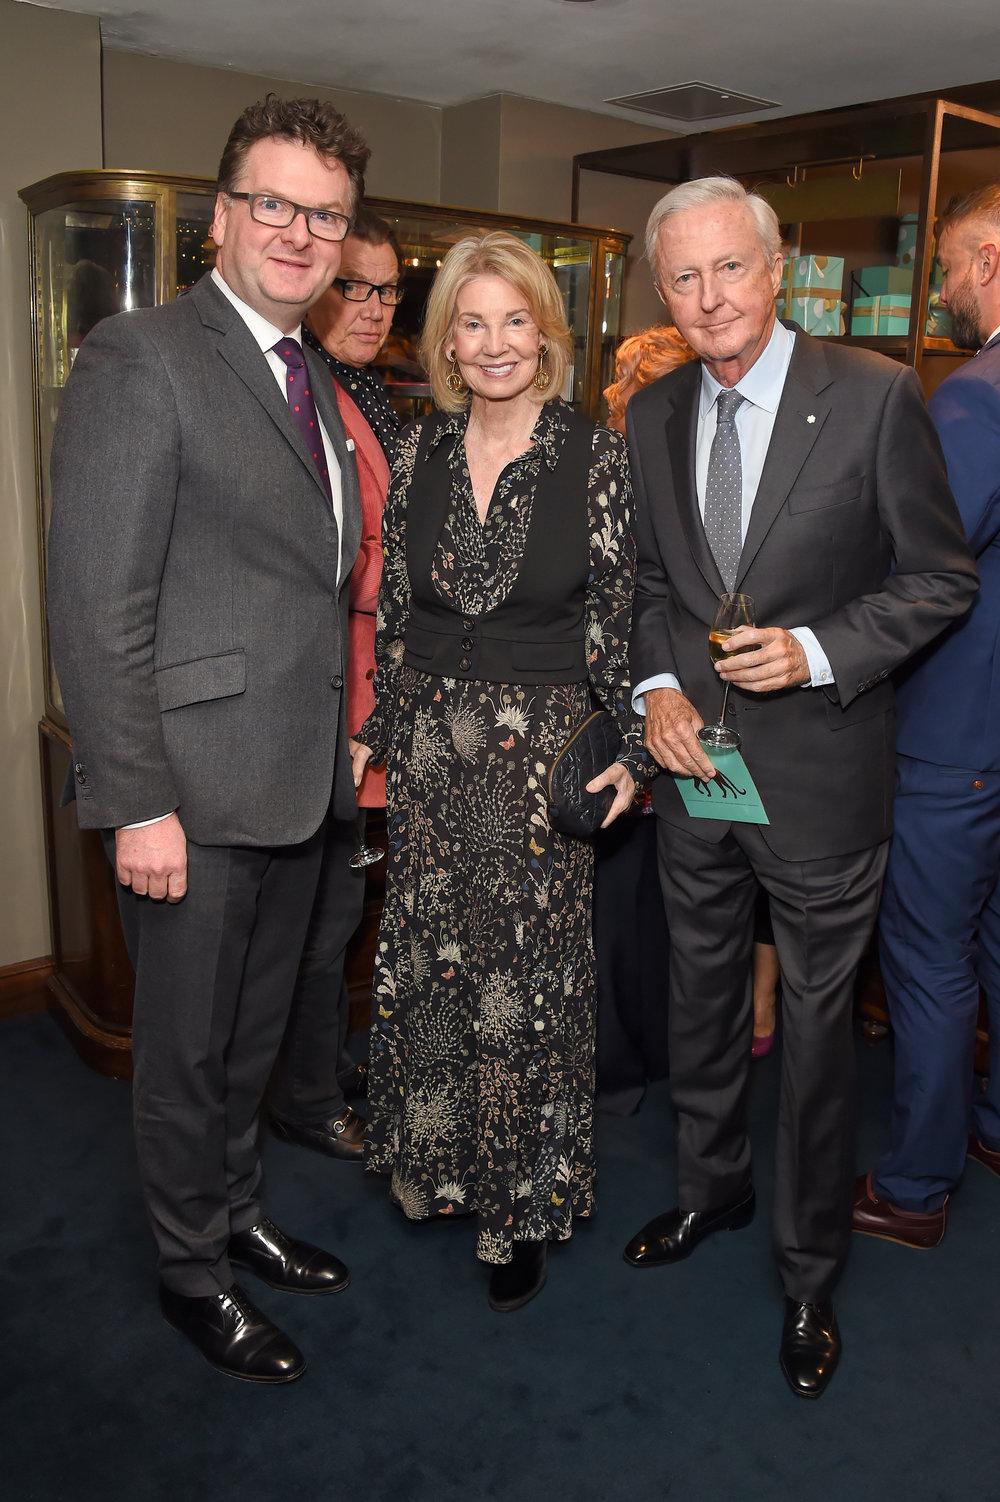 Ewan Venters, Hilary Weston and Galen Weston. Courtesy of Dave Benett.